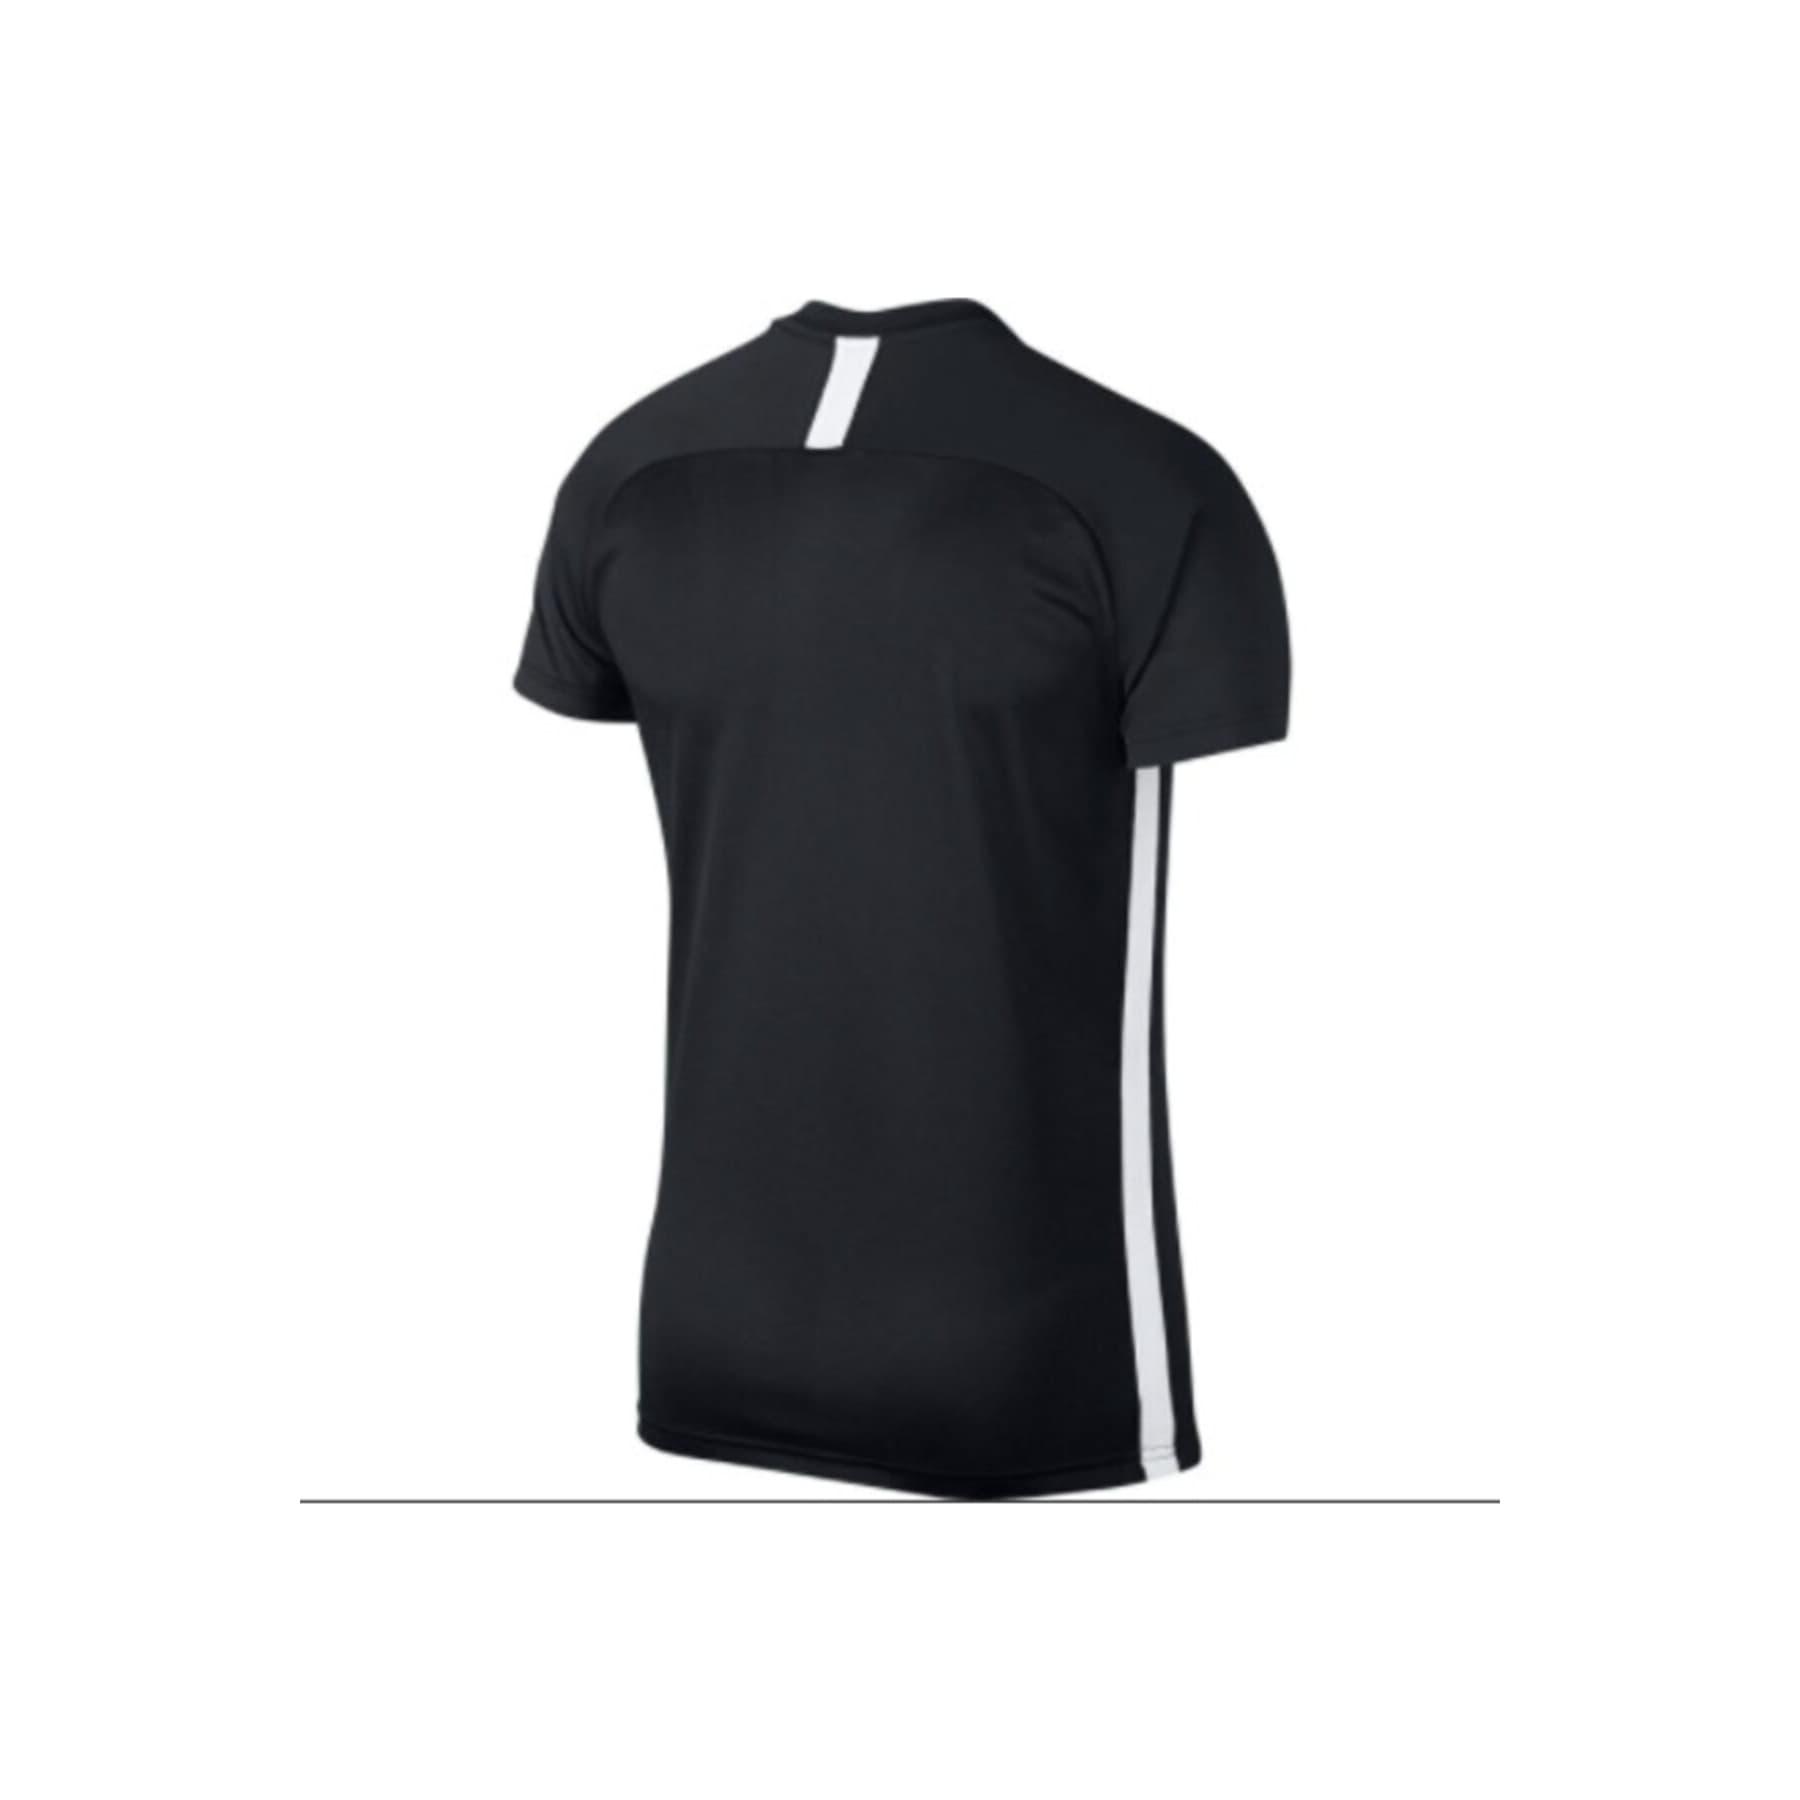 Dry Academy Erkek Siyah Futbol Tişört (AJ9996-010)